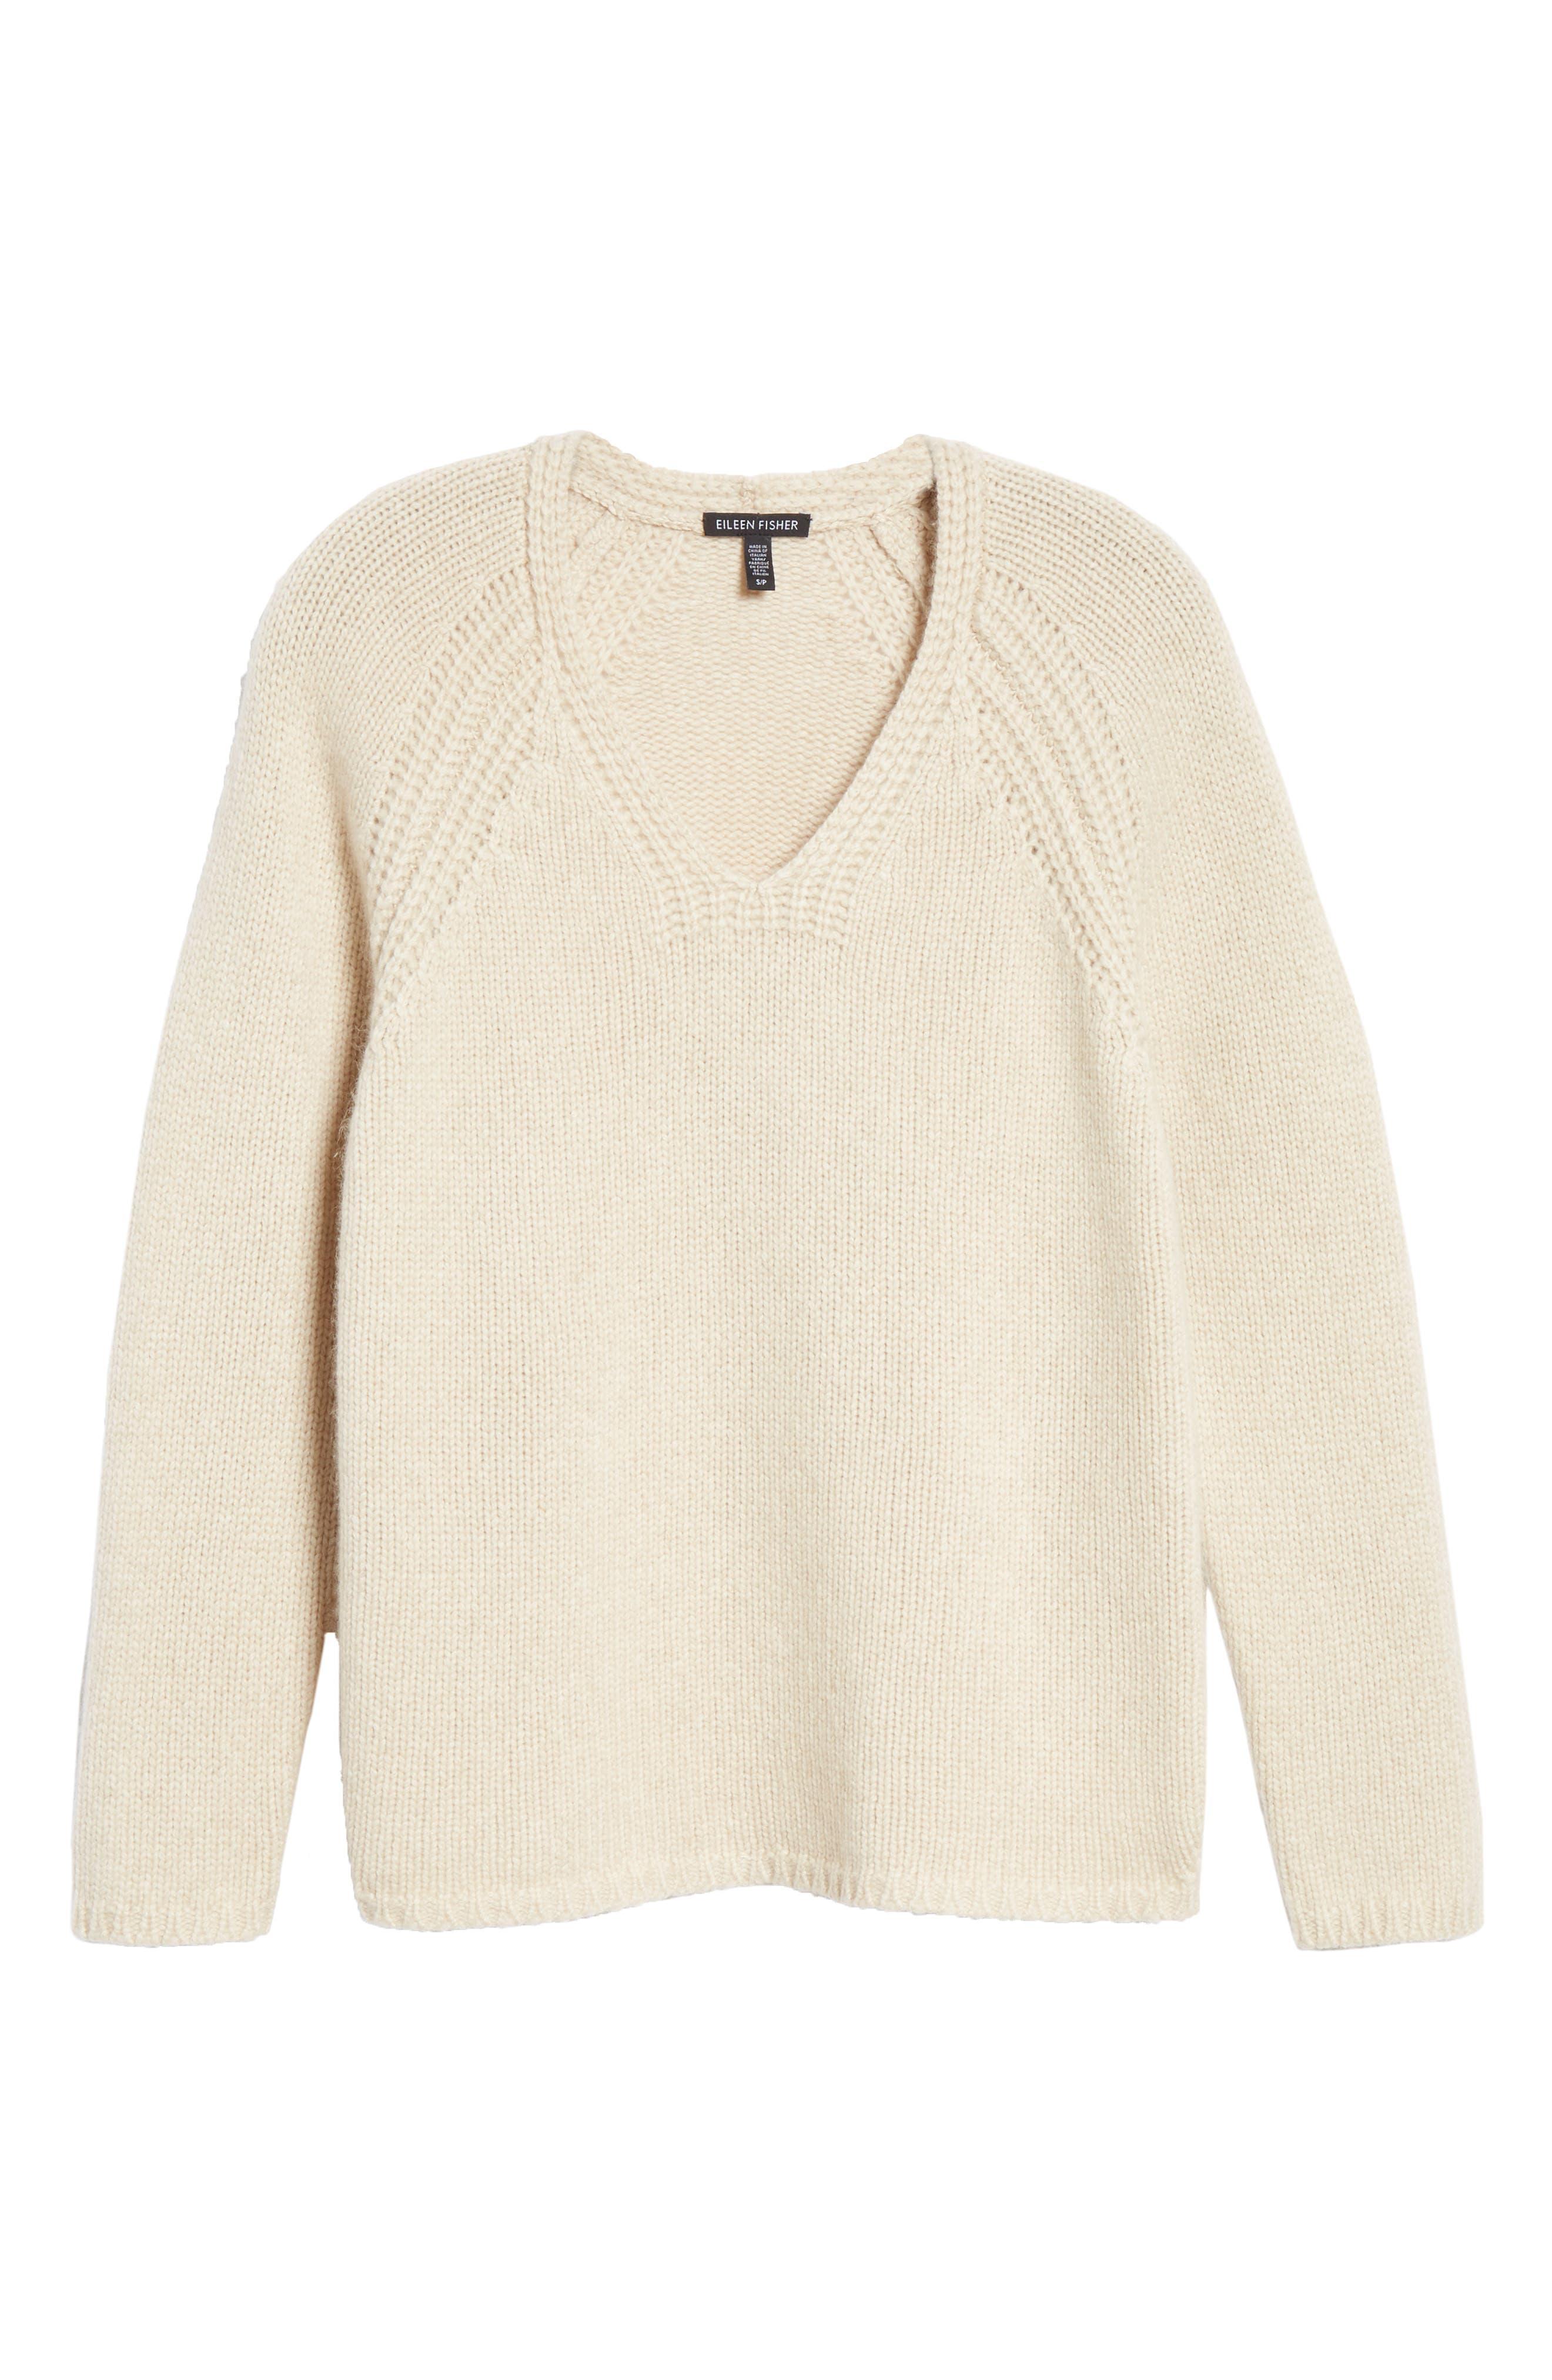 V-Neck Cashmere Sweater,                             Alternate thumbnail 6, color,                             264